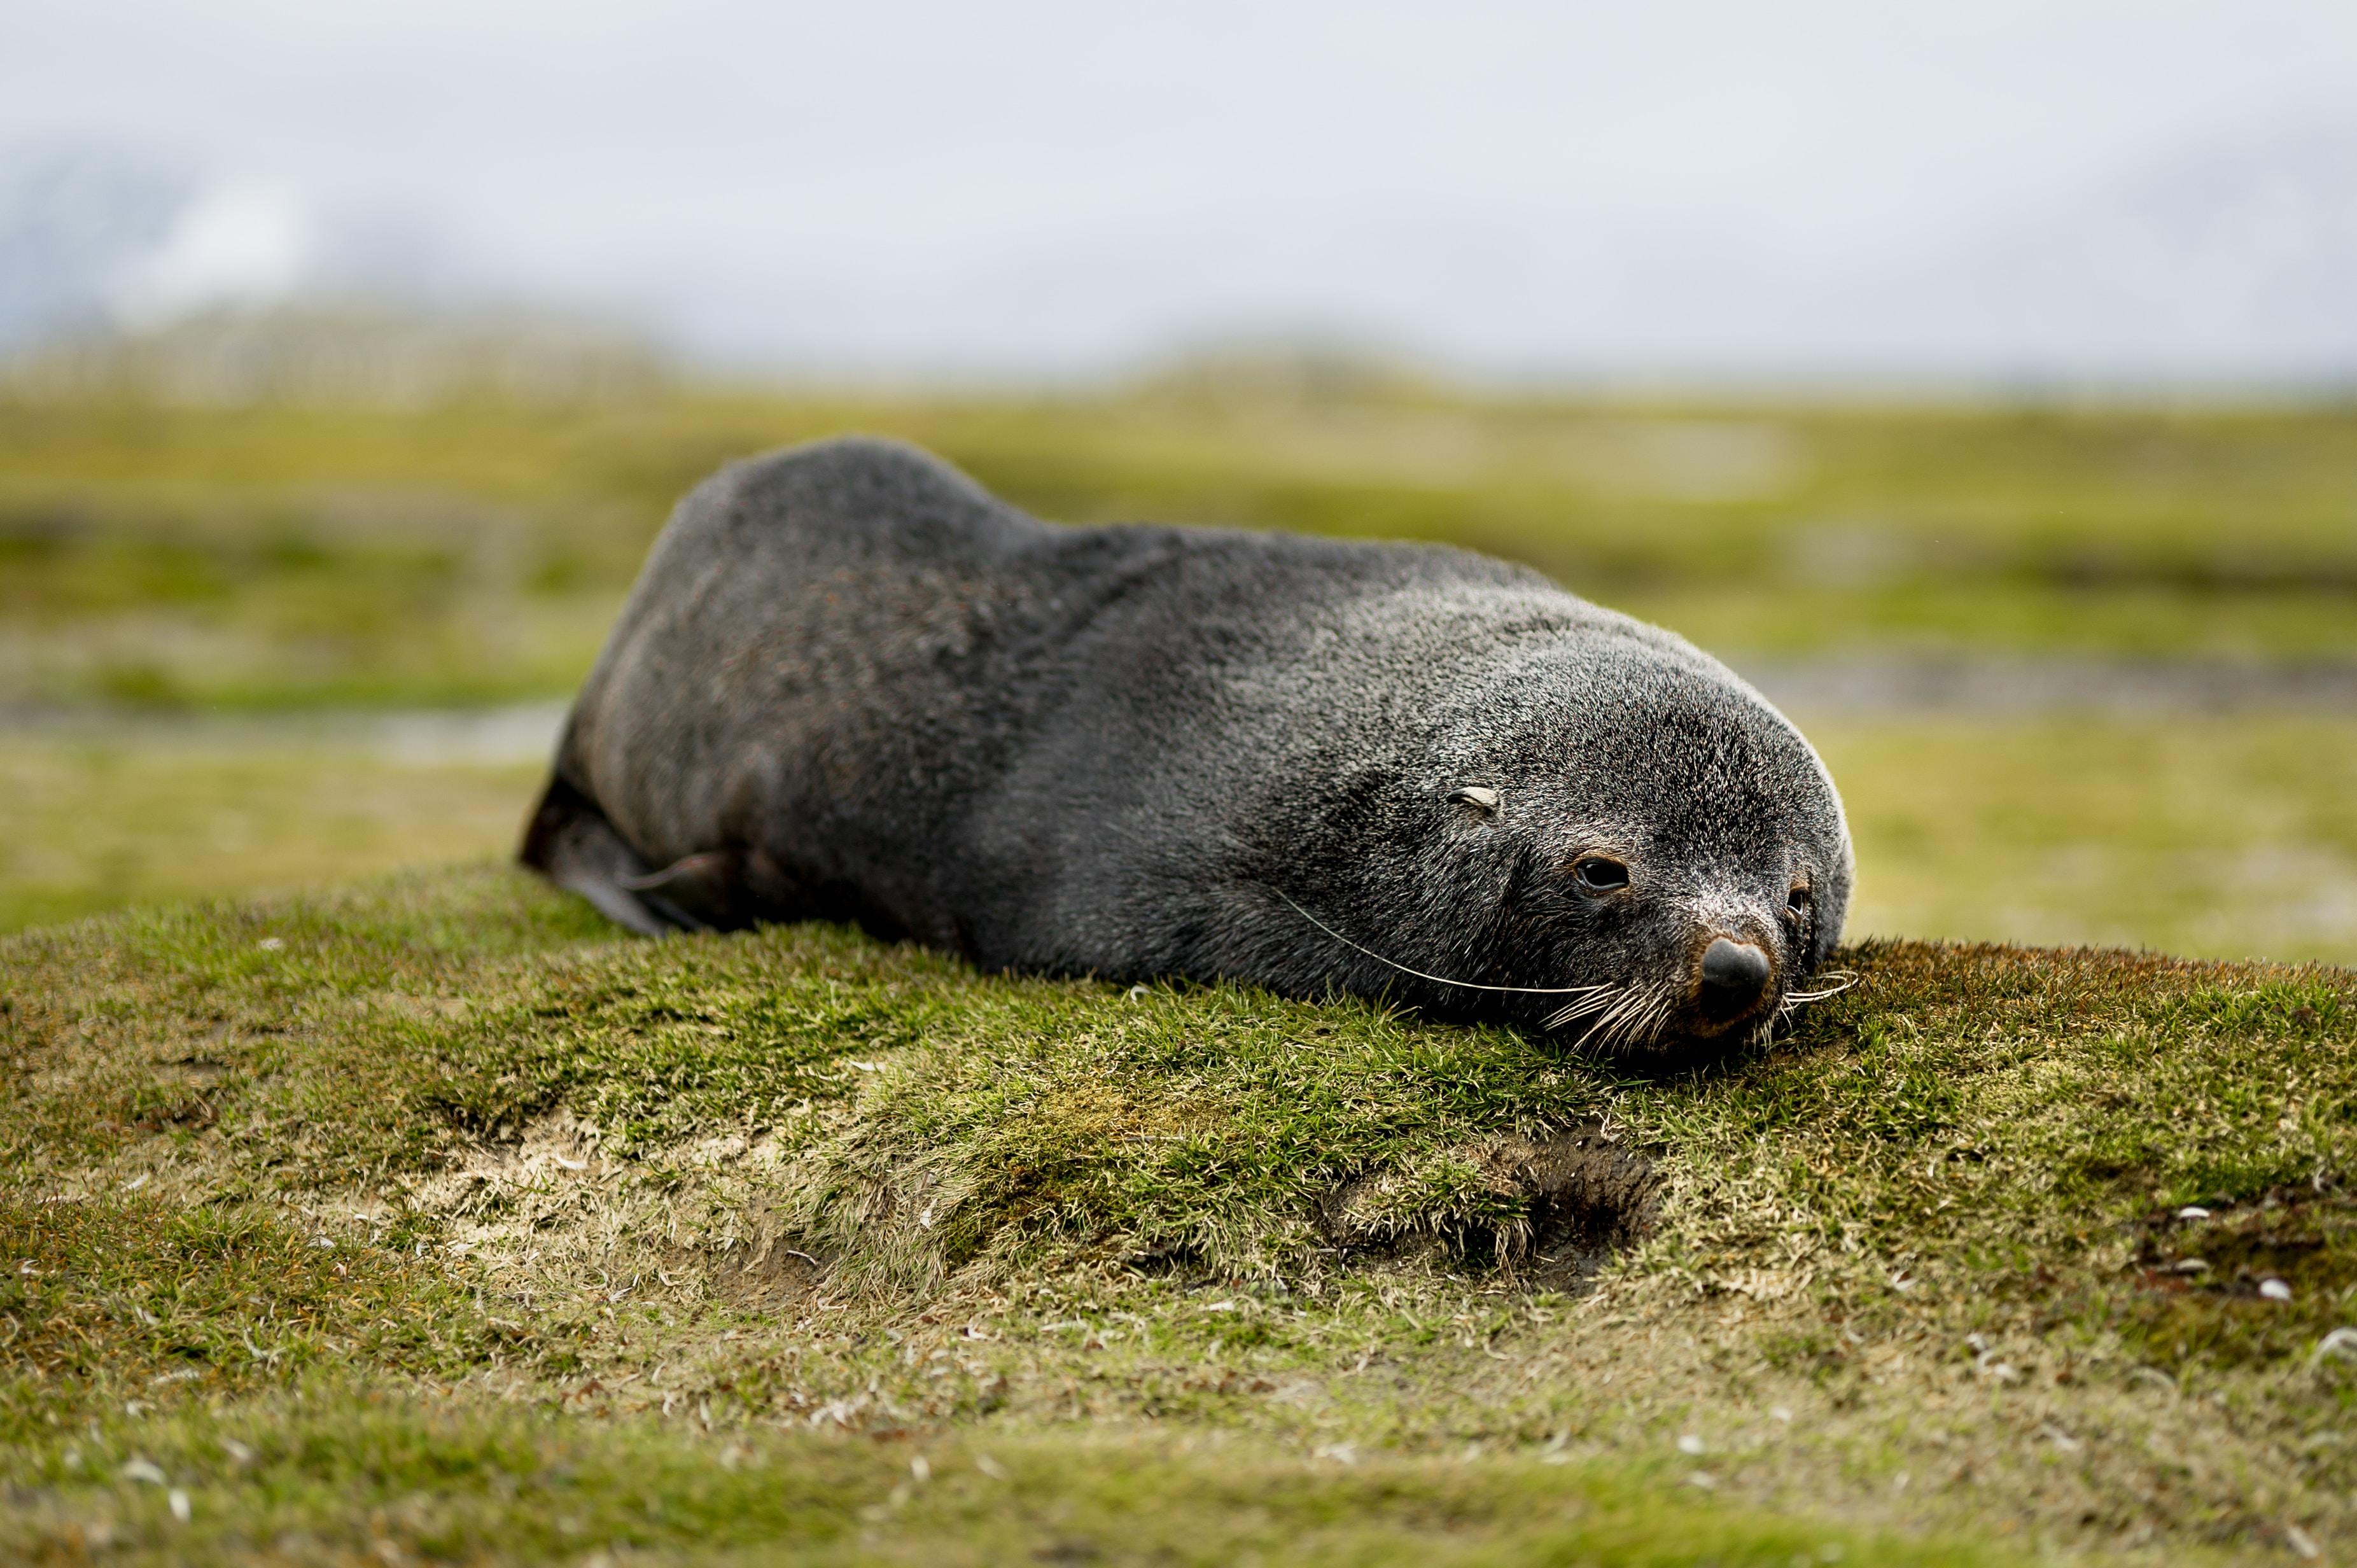 black animal lying on ground